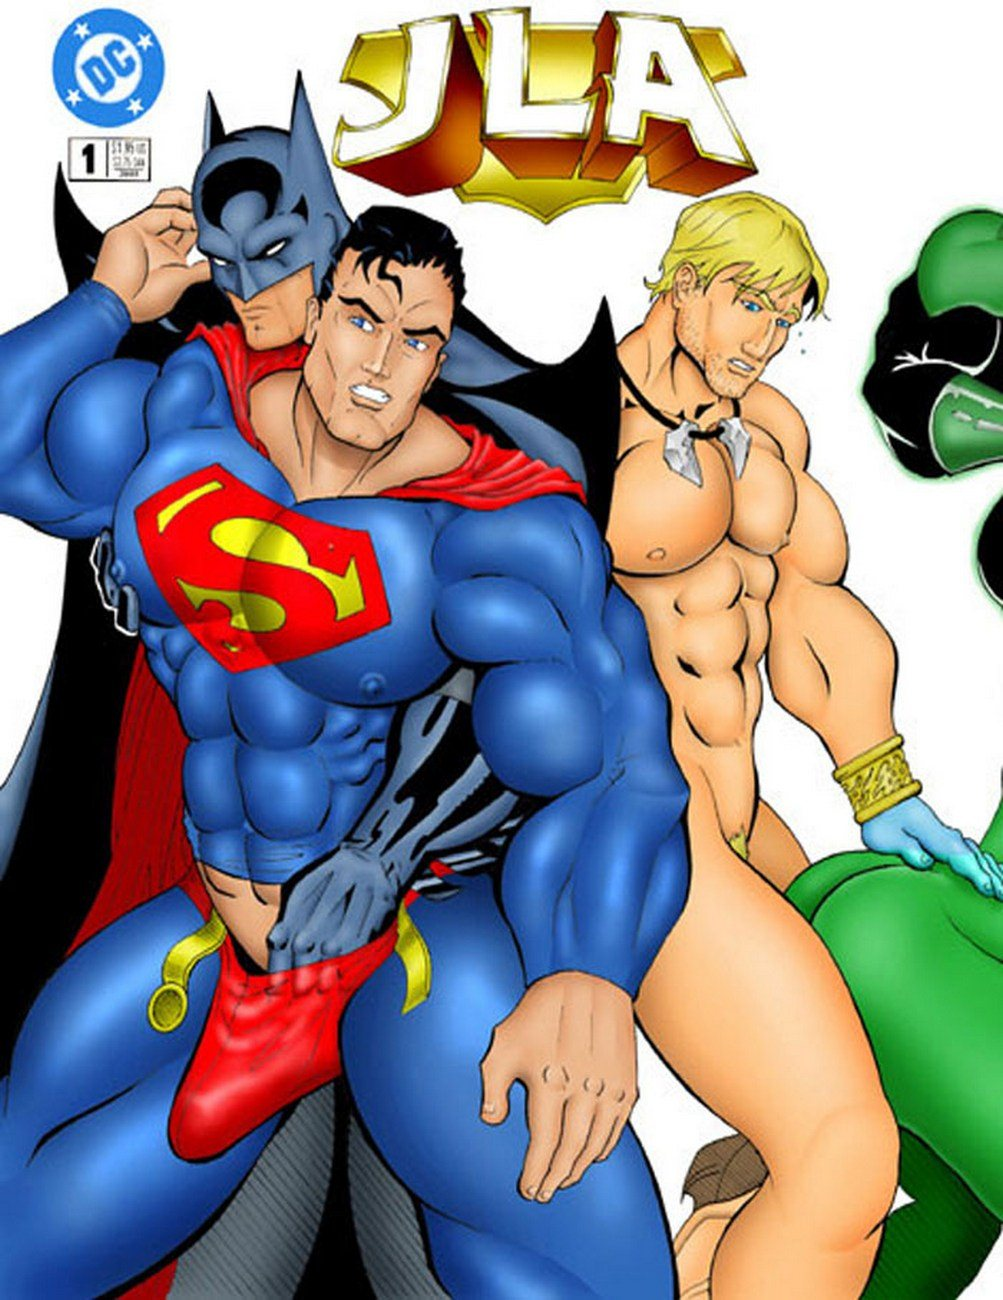 Porn Comics - Superman JLA- Iceman Blue porn comics 8 muses